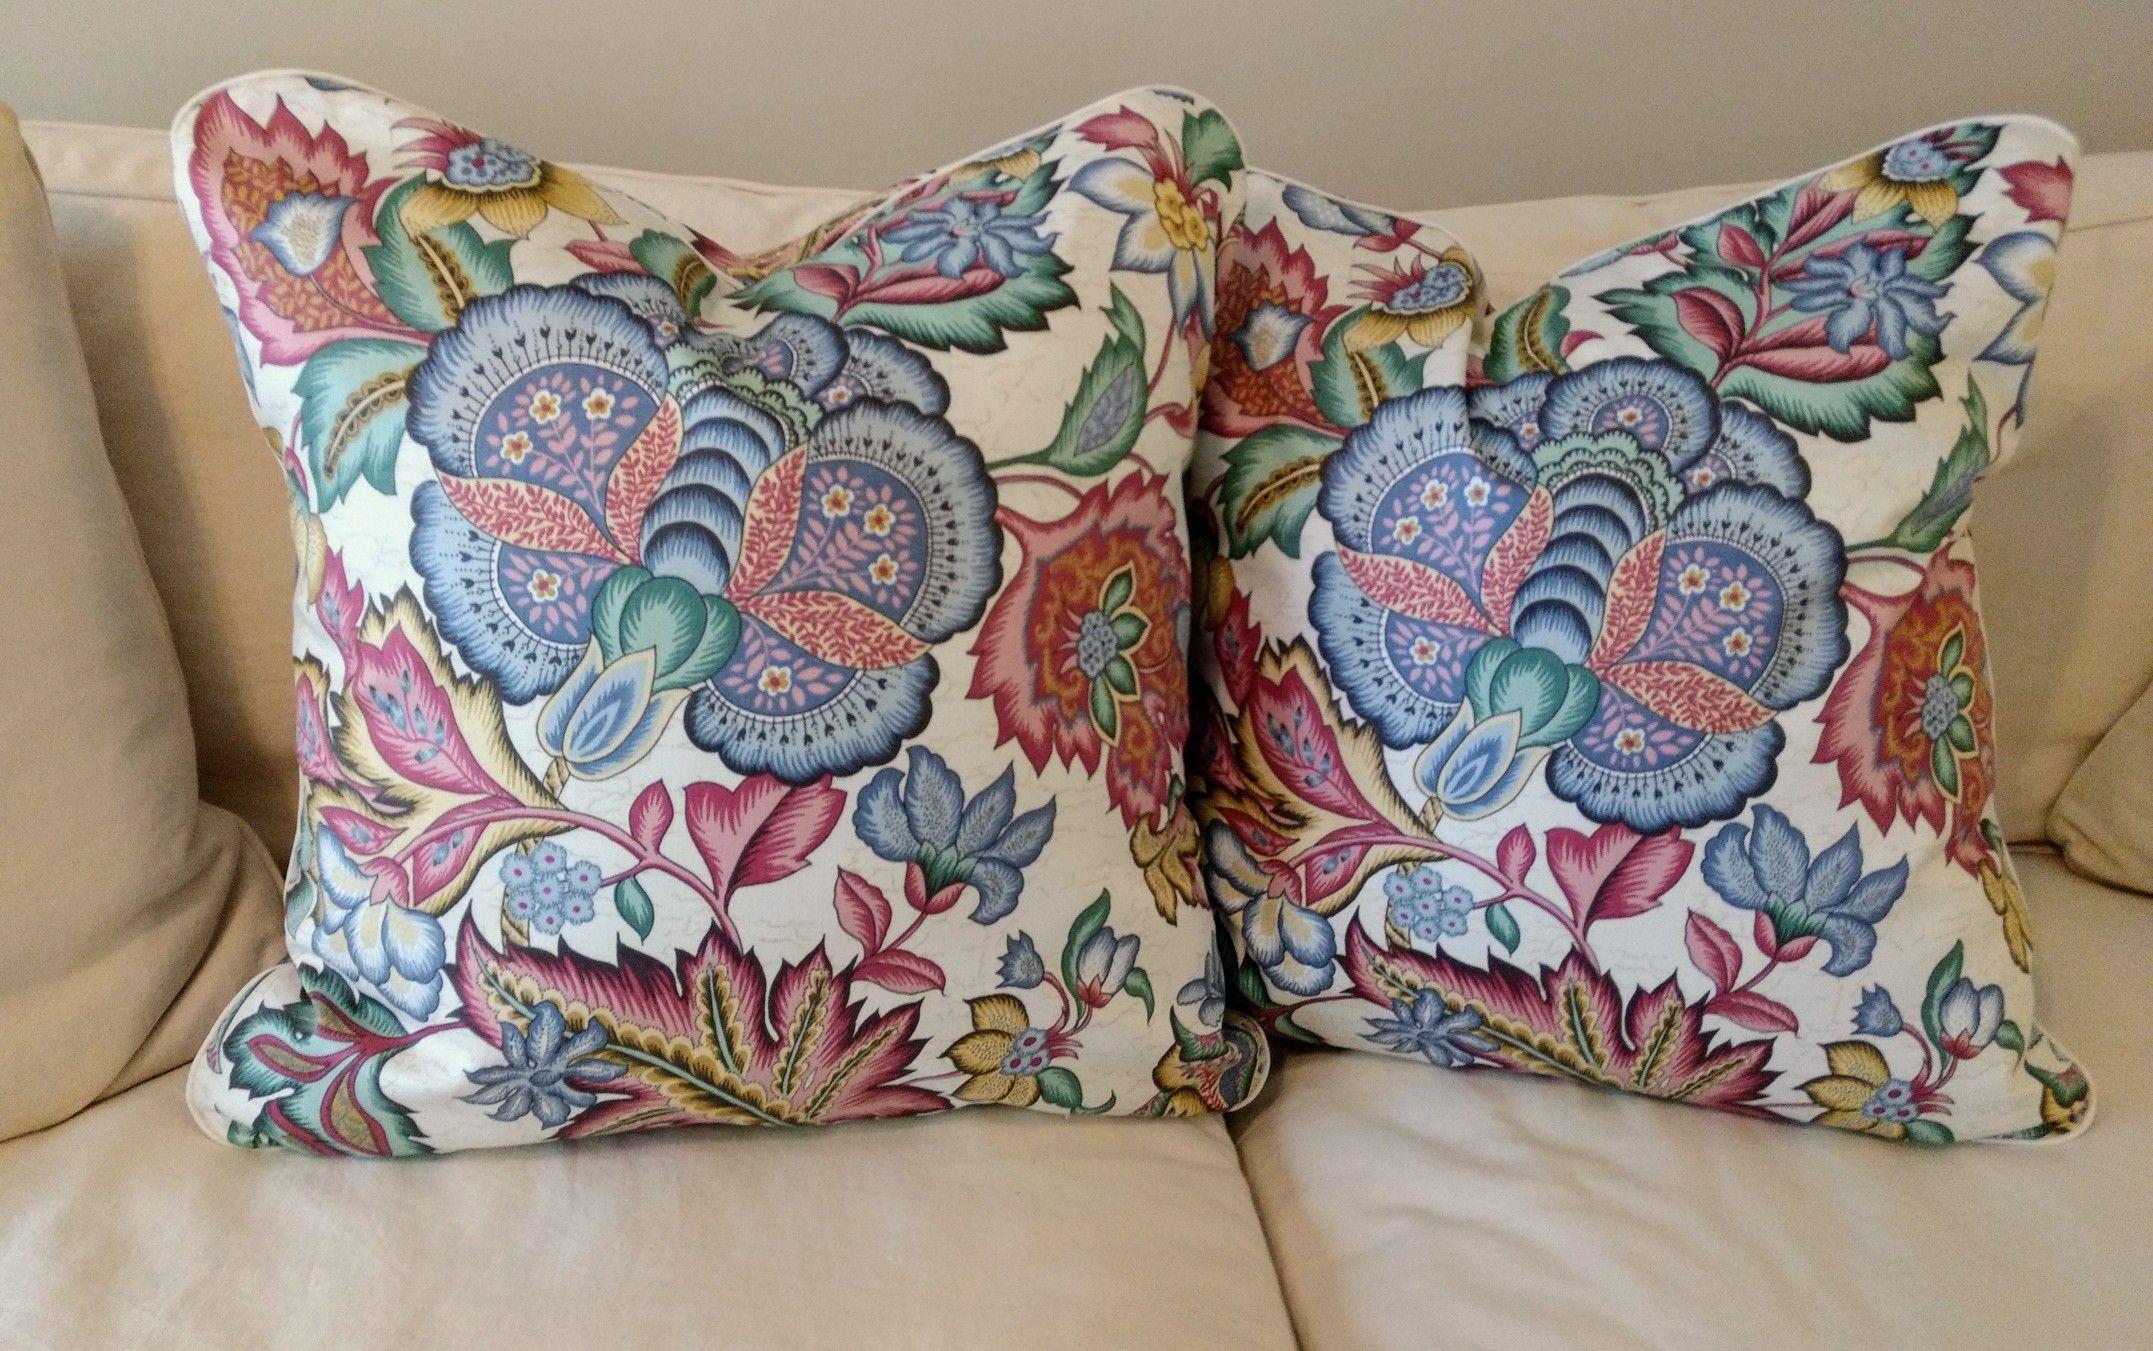 Waverly Pillows Pillows Waverly Fabric Decorative Pillows